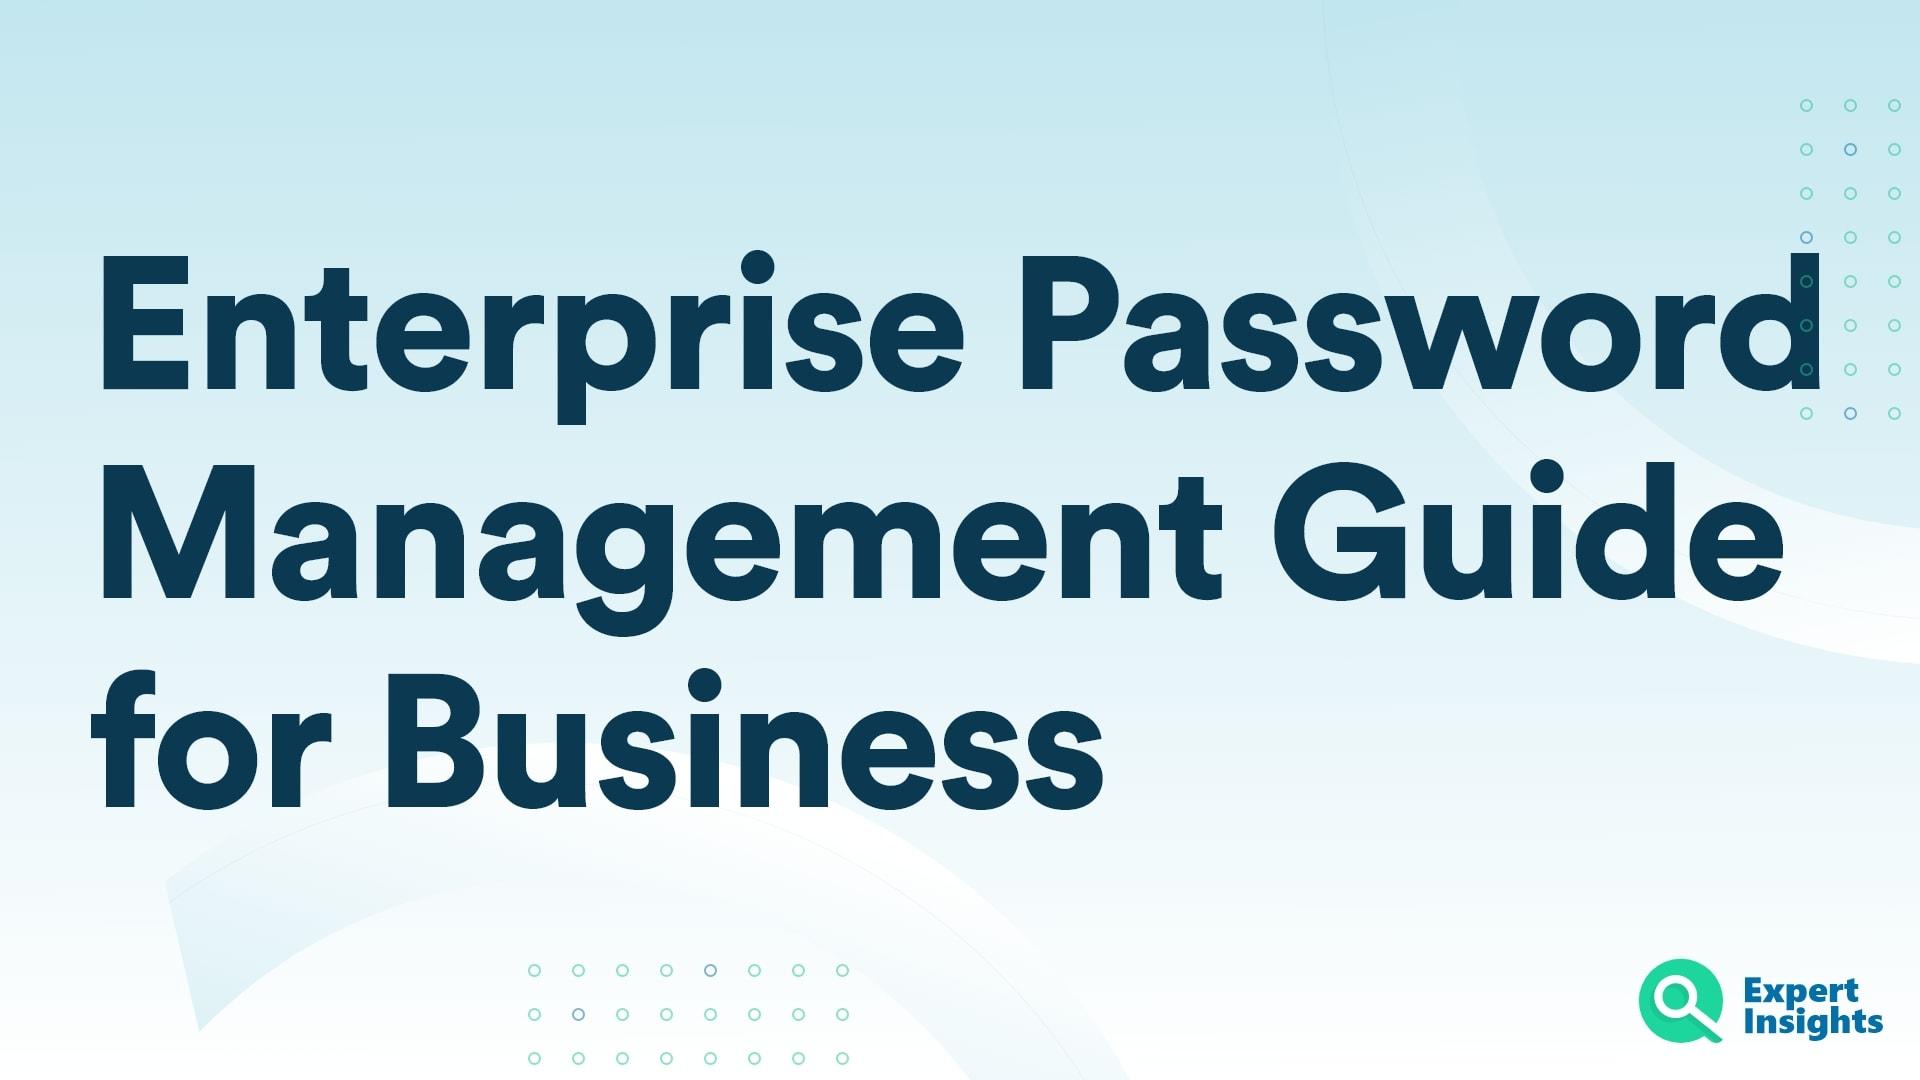 Enterprise Password Management Guide For Business - Expert Insights